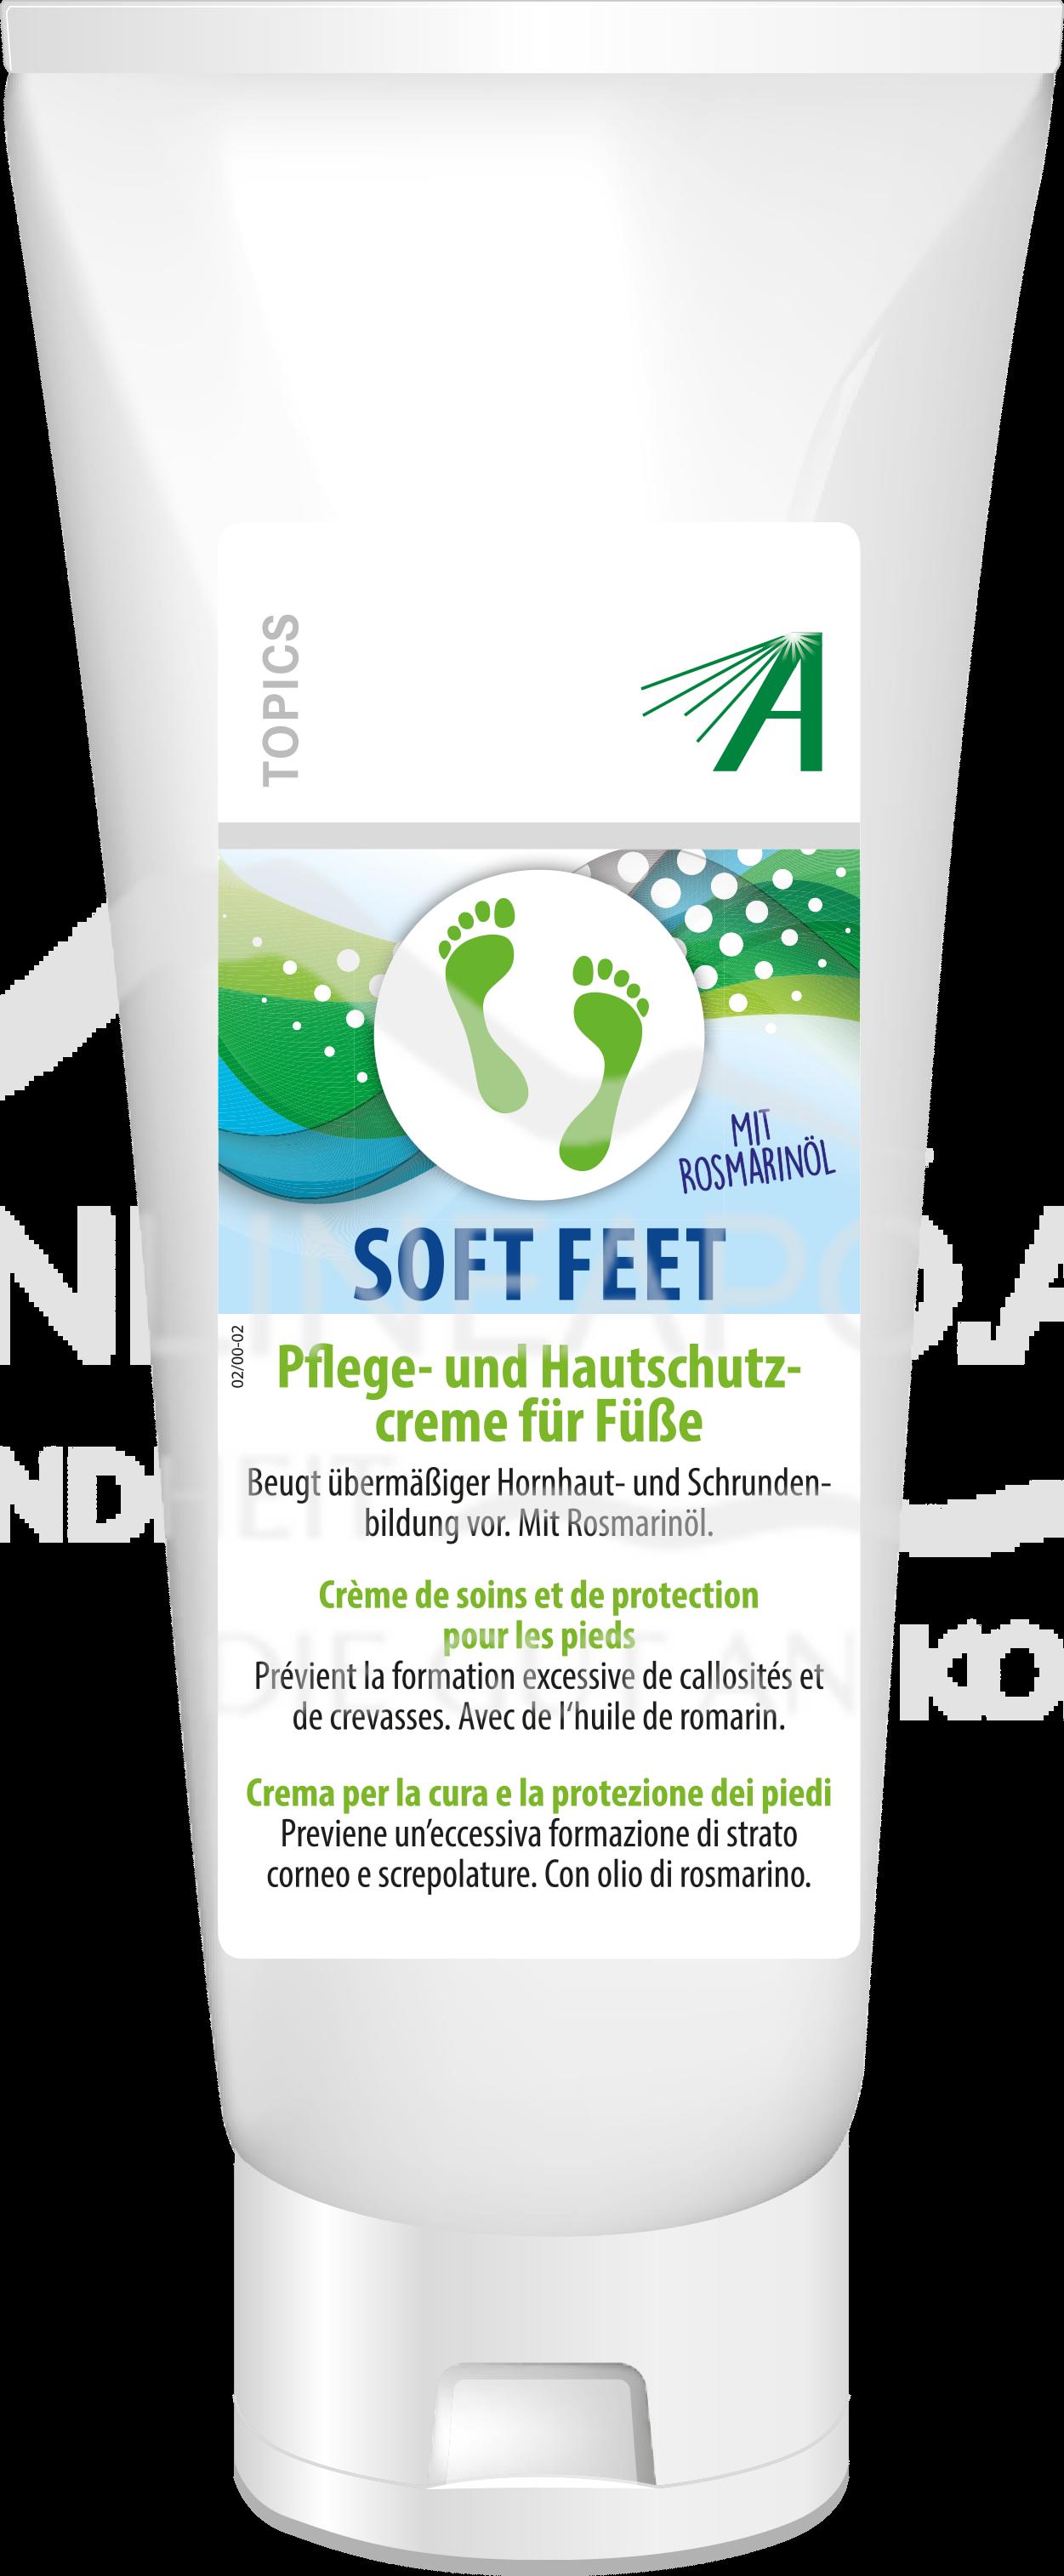 Adler Soft Feet Fußcreme